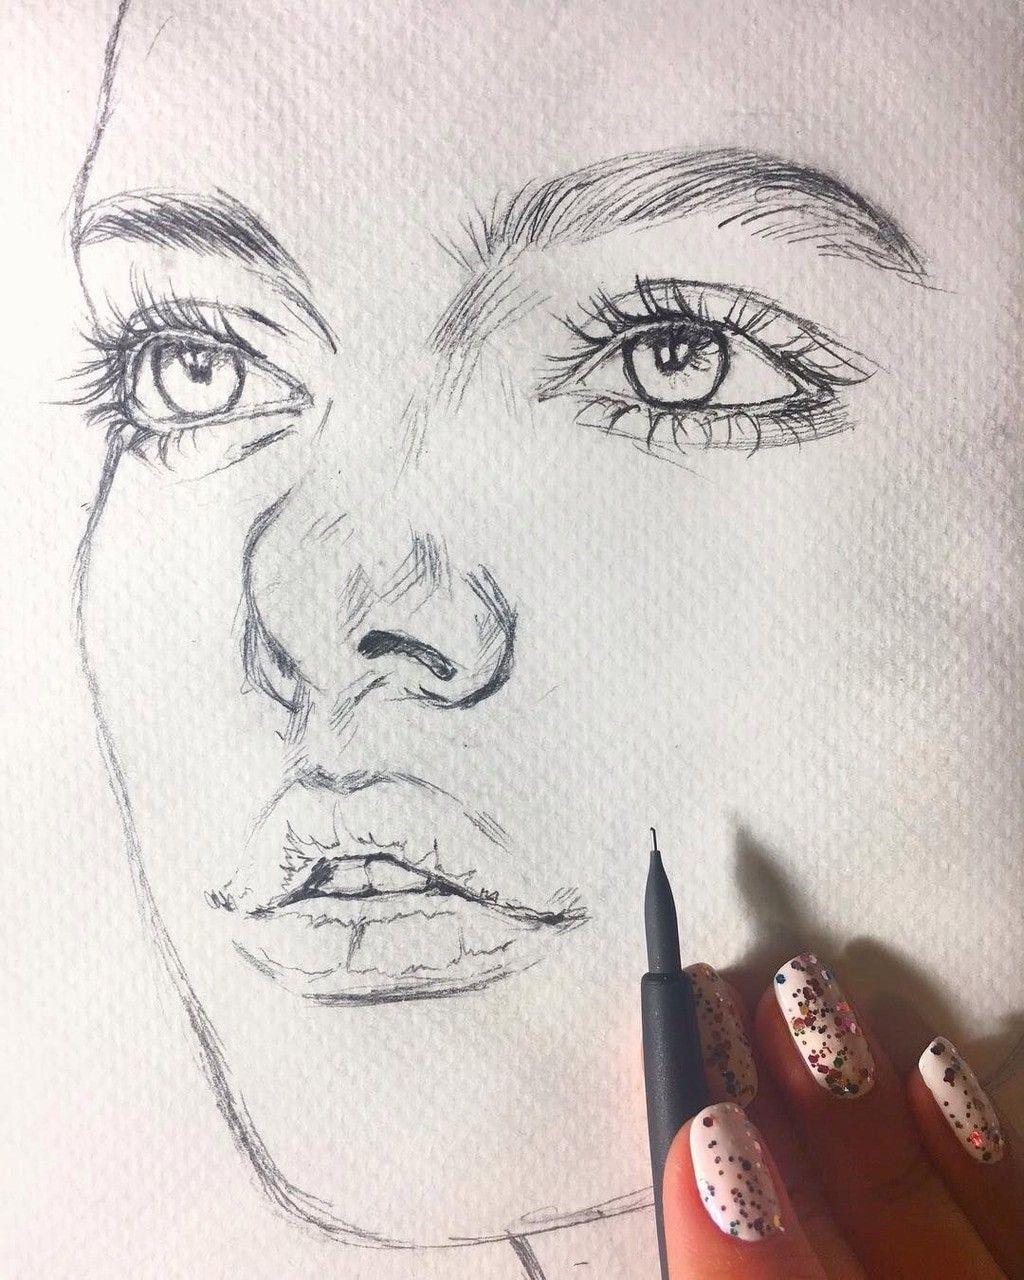 Pin By Xxemokittyxx On Drawing Ideas Art Sketches Art Drawings Sketches Pencil Art Drawings